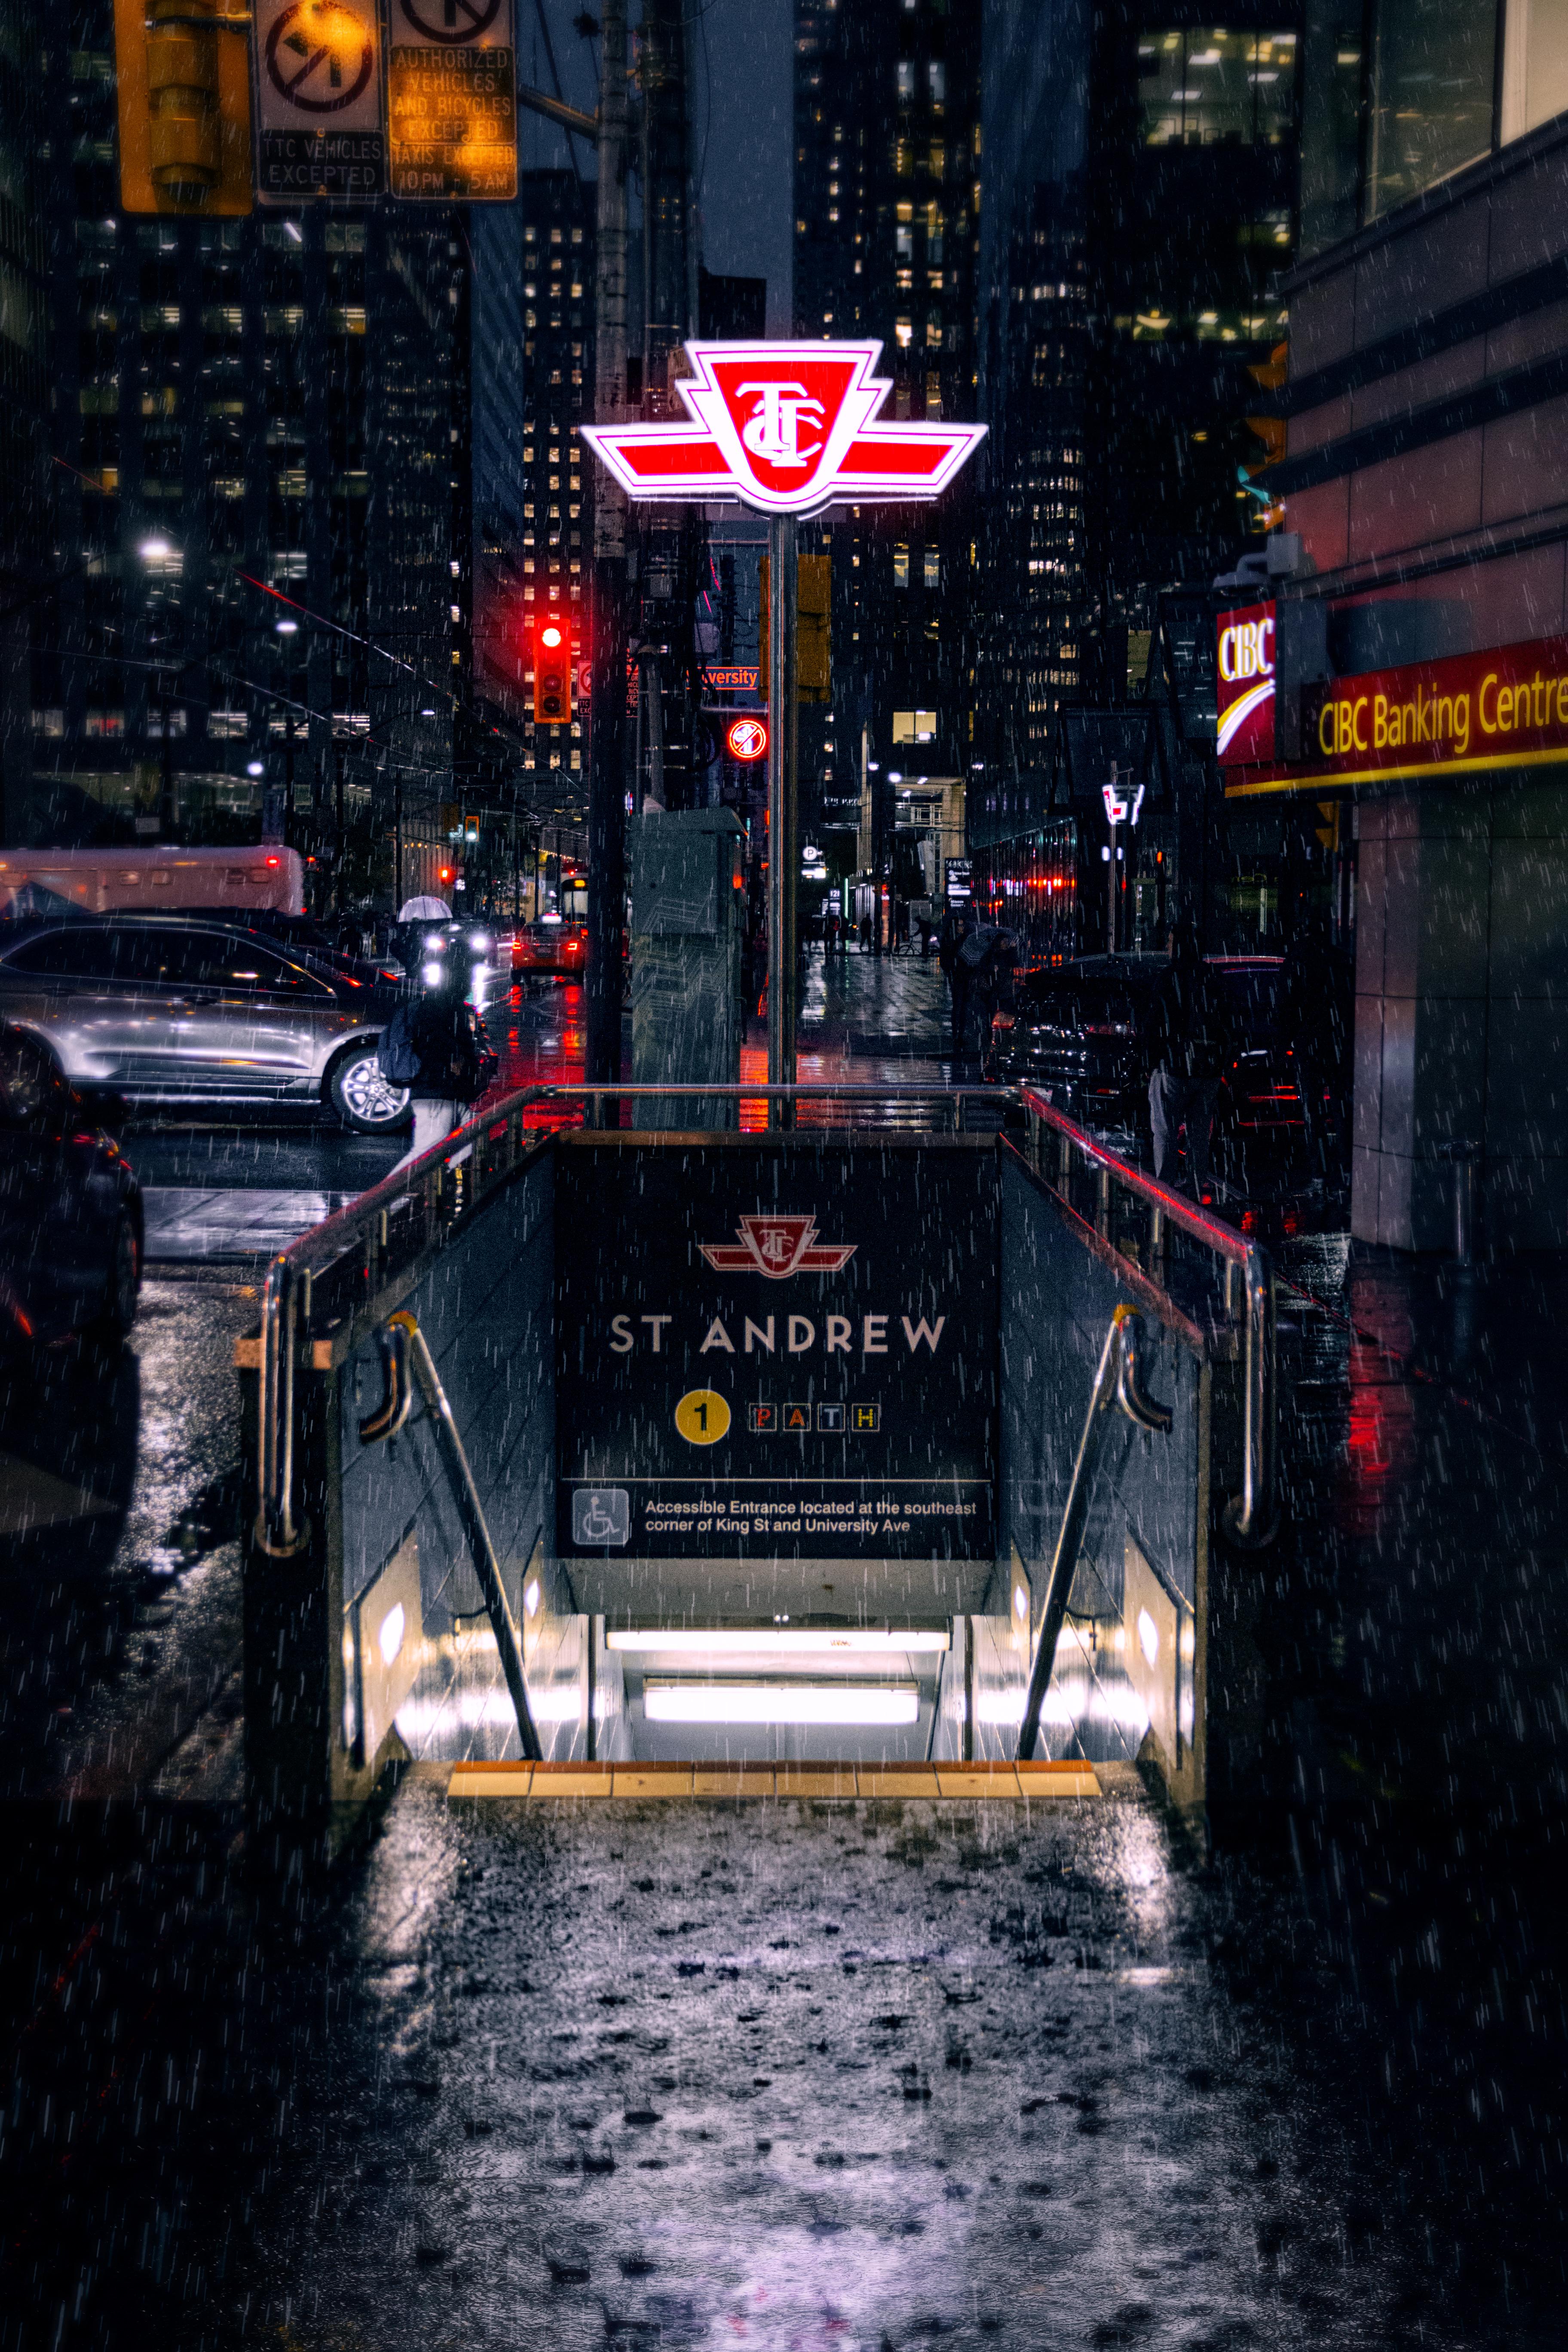 Subway Entrance During Nighttime